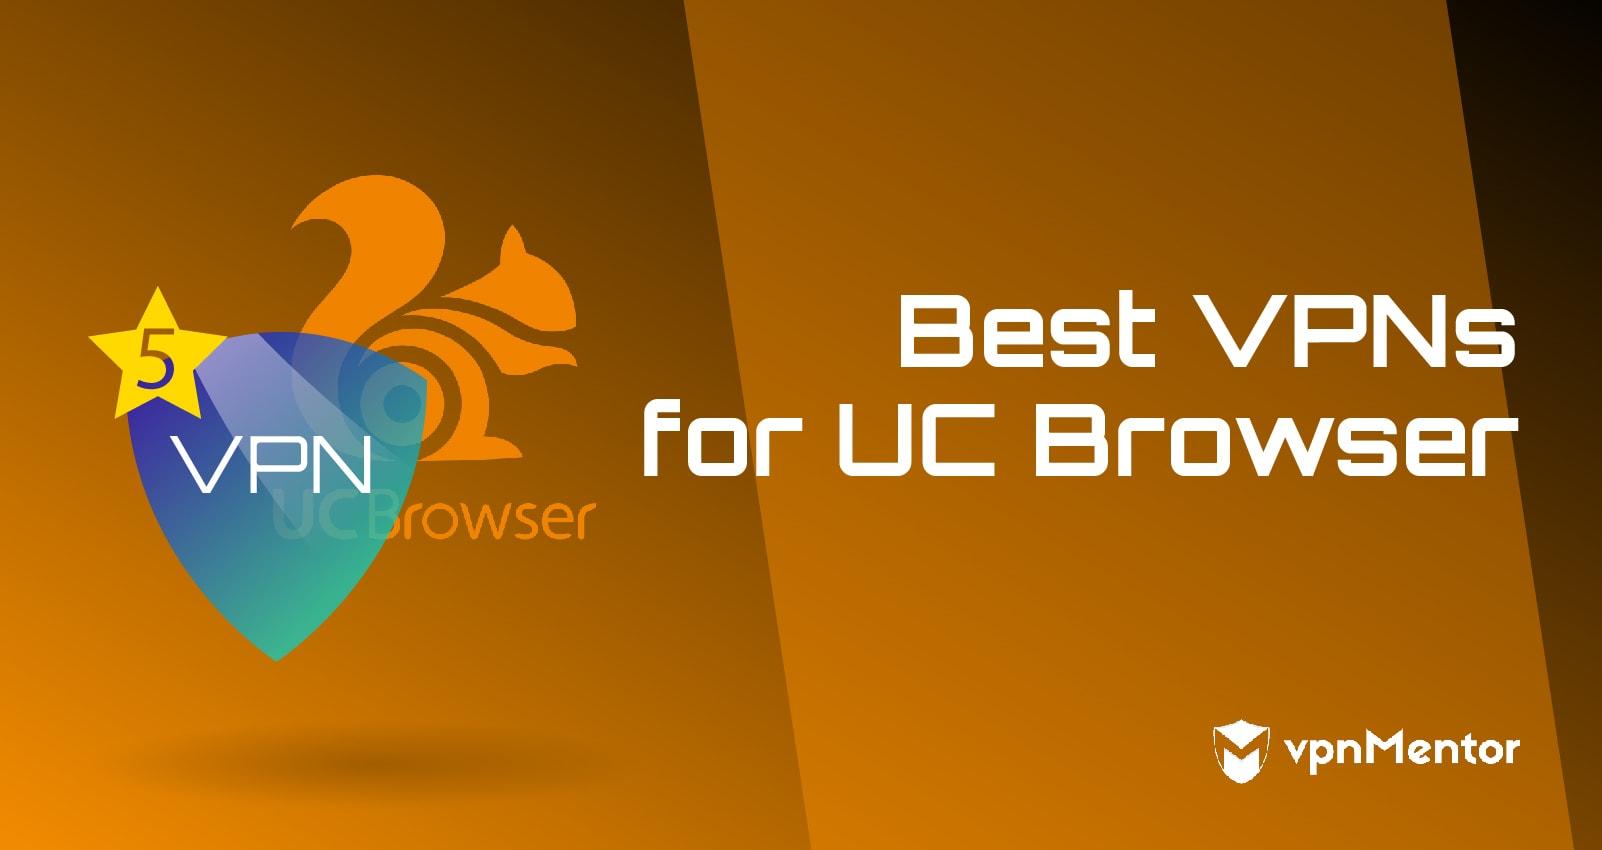 Best VPNs for UC Browser